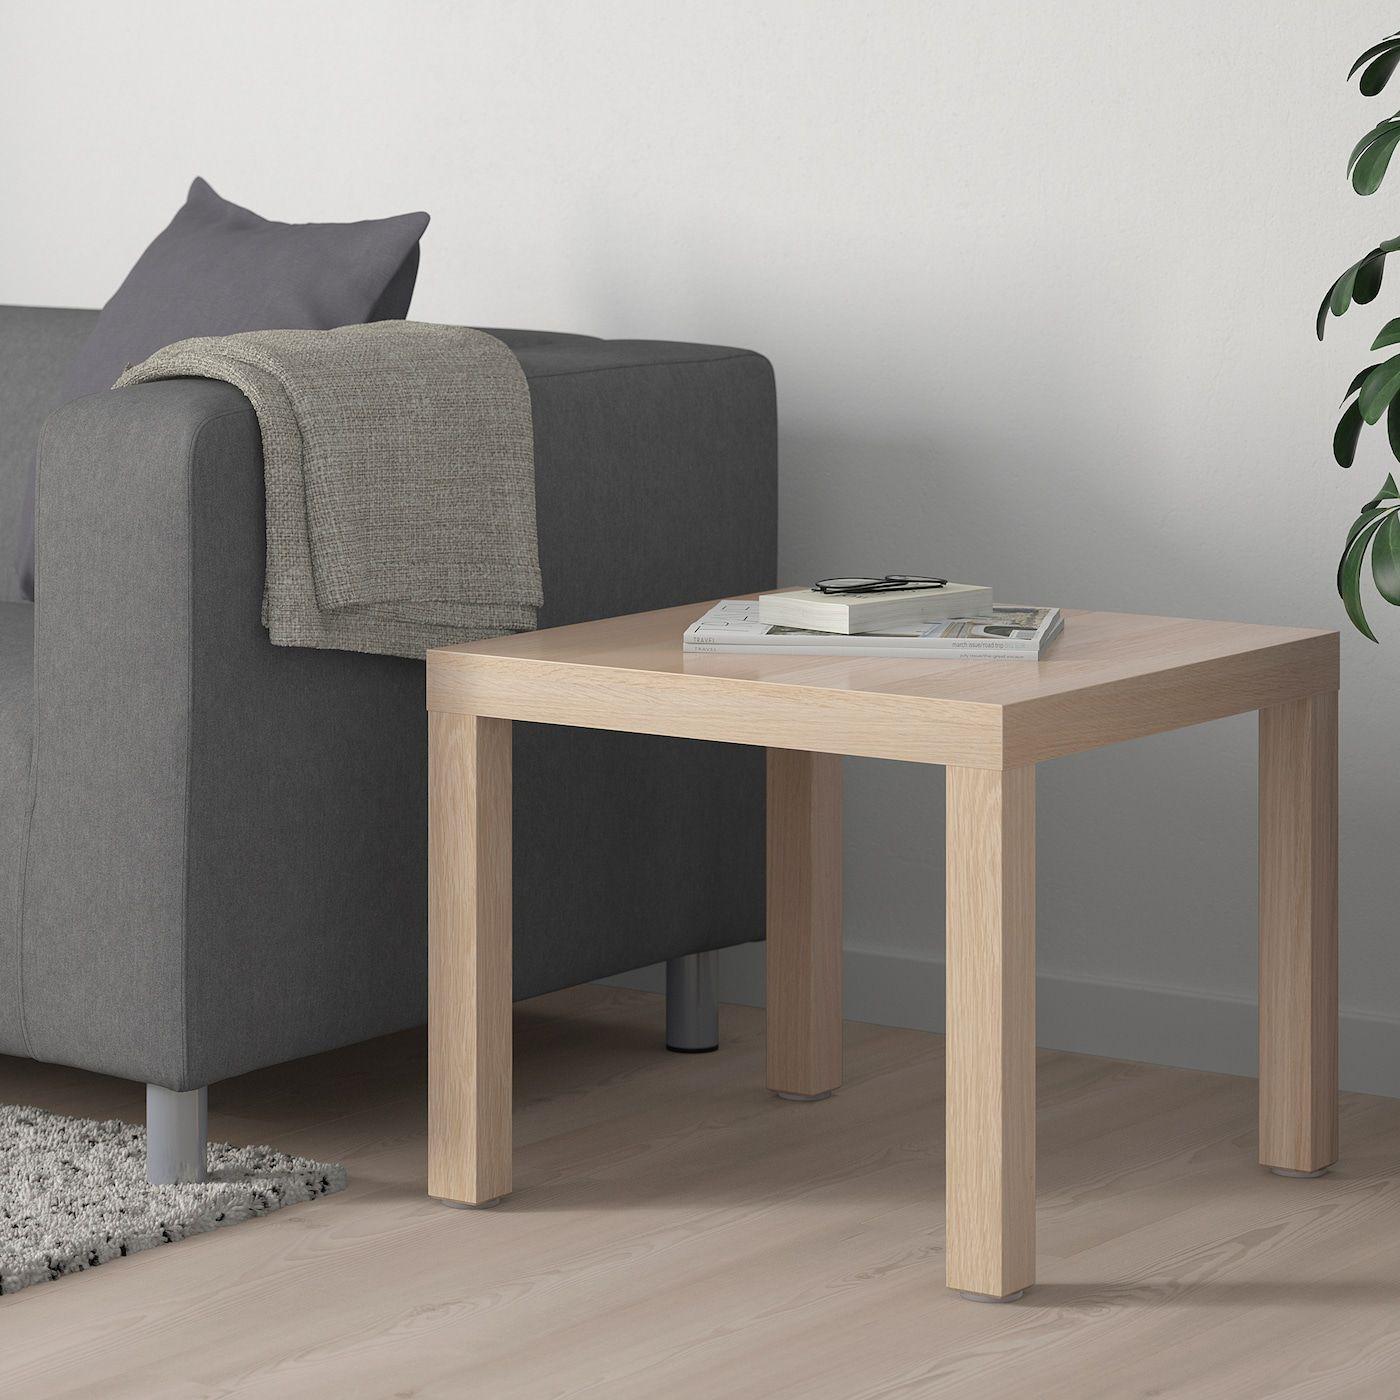 Lack Side Table White Stained Oak Effect 21 5 8x21 5 8 Ikea Beistelltisch Weiss Ikea Mangel Ikea Beistelltisch [ 1400 x 1400 Pixel ]